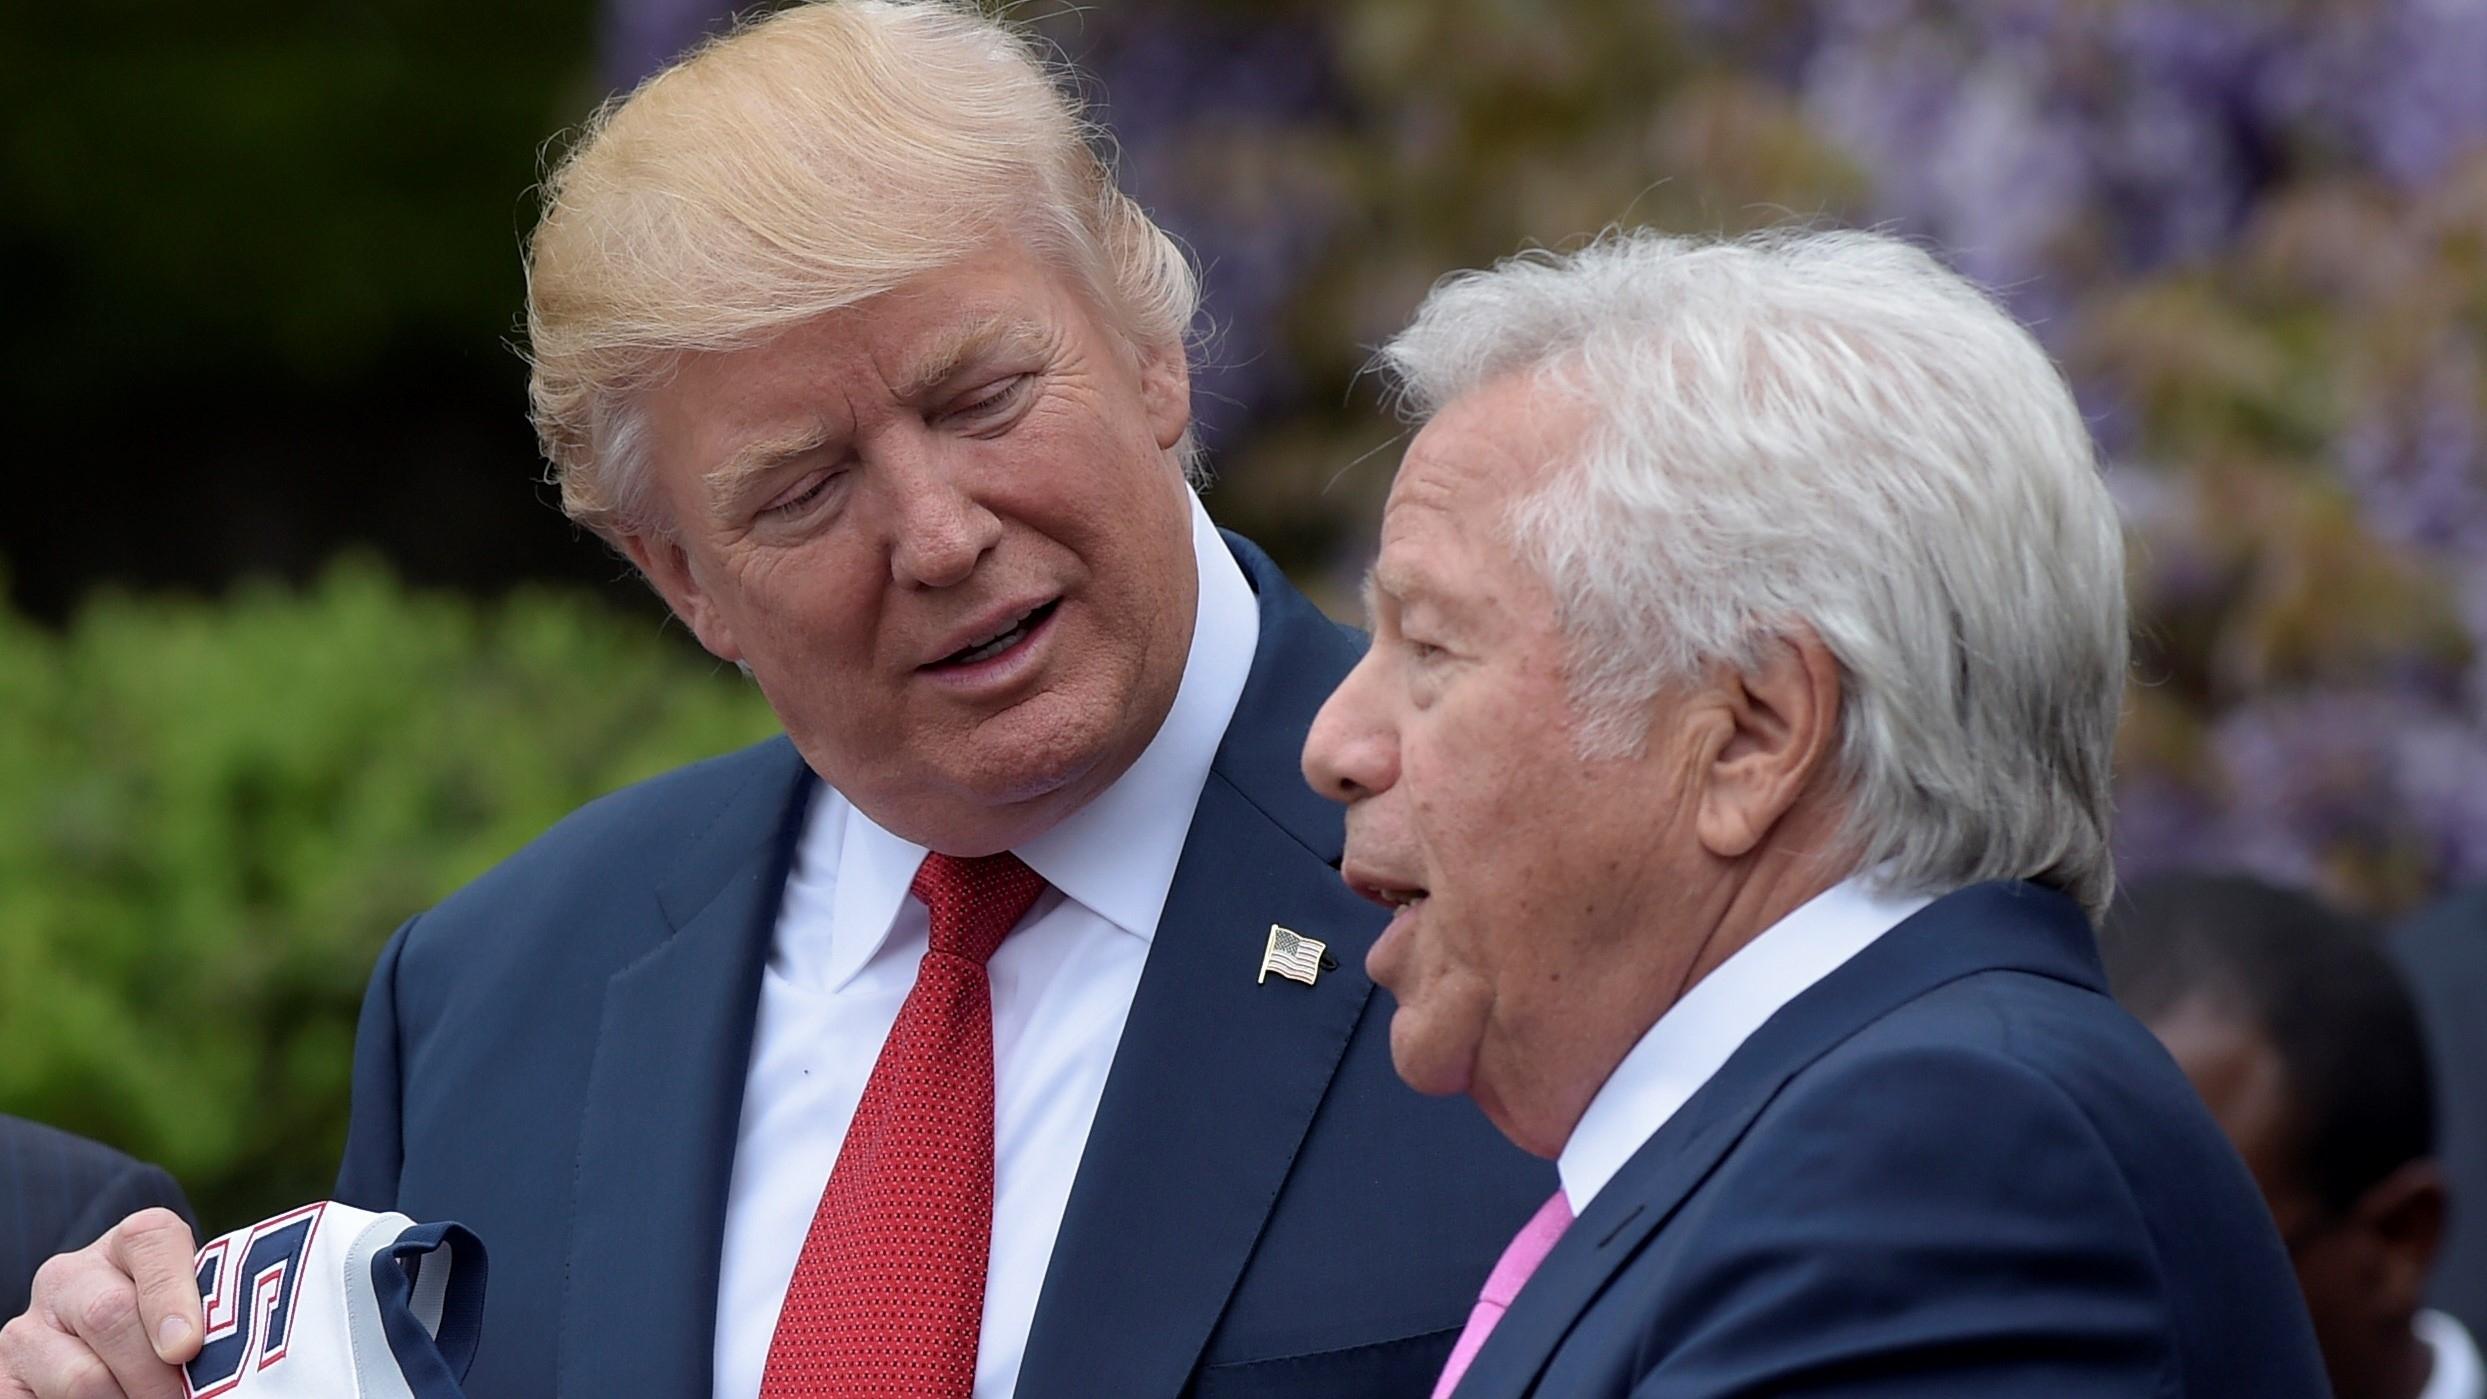 Scaramucci Says Kraft Gave Super Bowl Li Ring To Trump pertaining to Trump Super Bowl Kraft